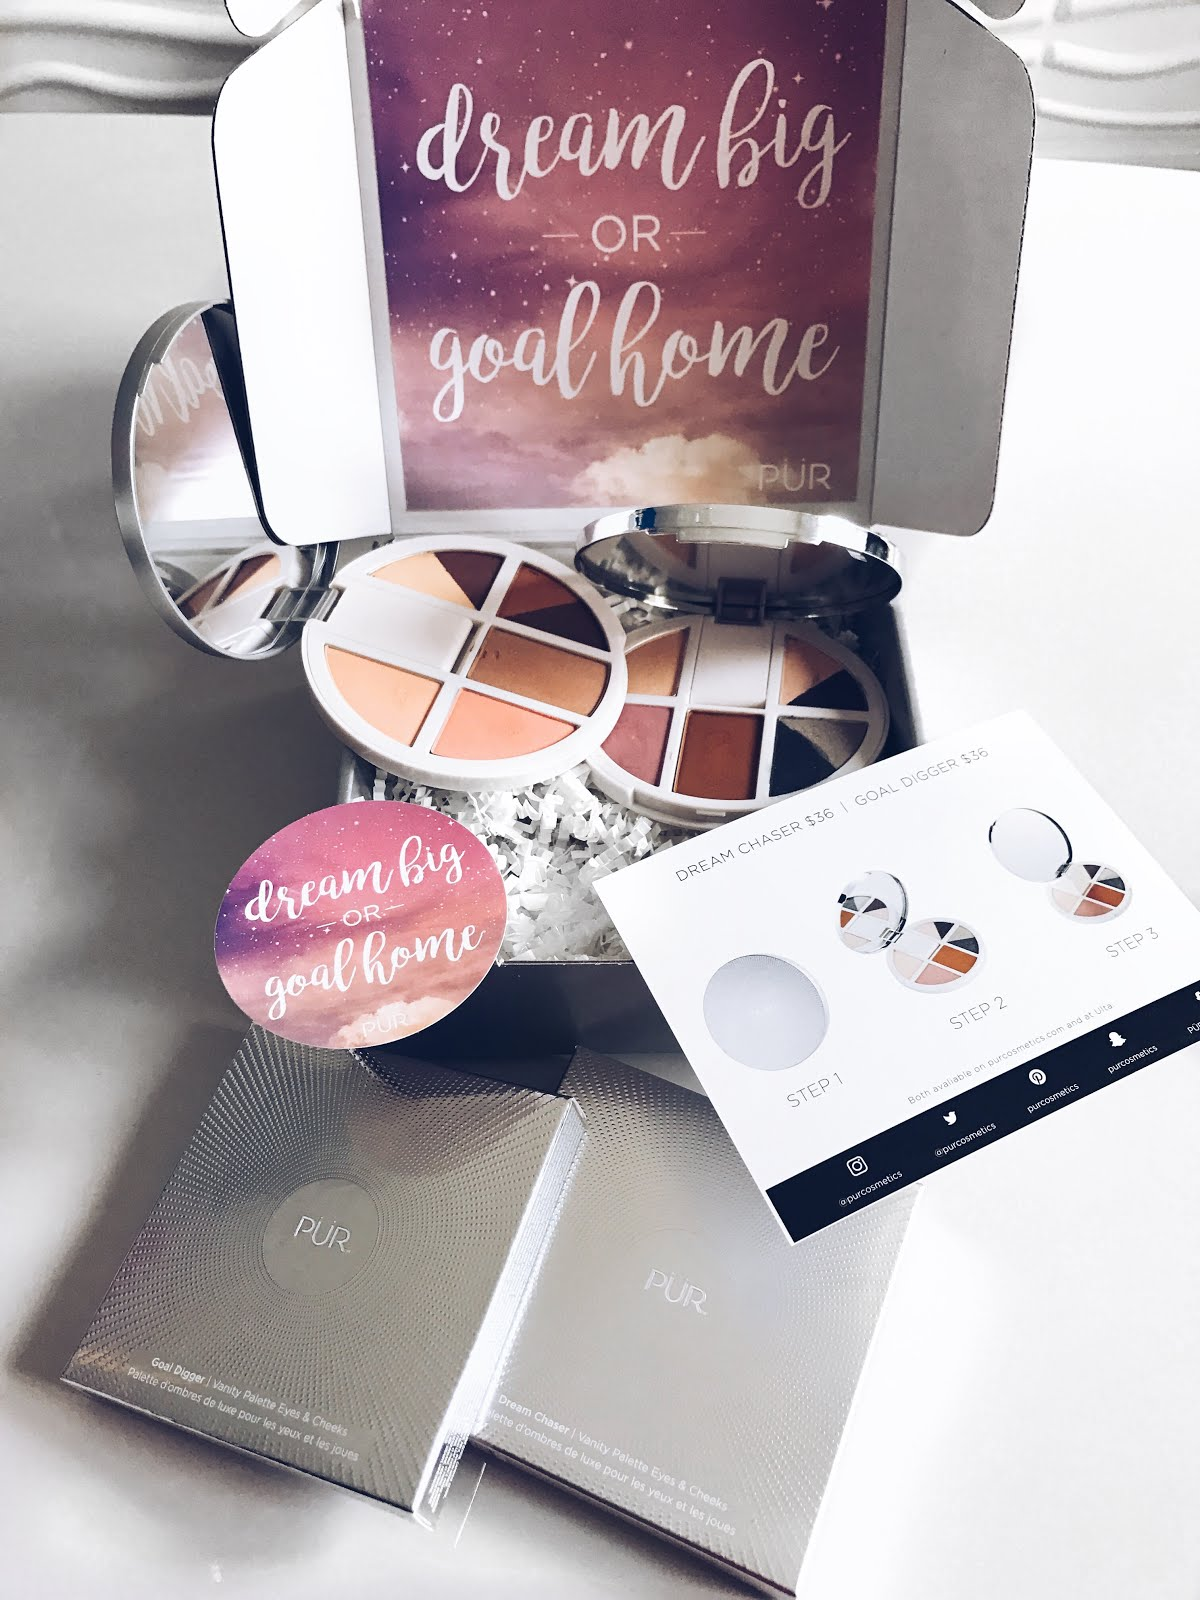 POM-Mail-Dermalogica-Pur-Cosmetics-Milk-Makeup-Sky-Organics-Milani-Cosmetics-and-More-Vivi-Brizuela-PinkOrchidMakeup